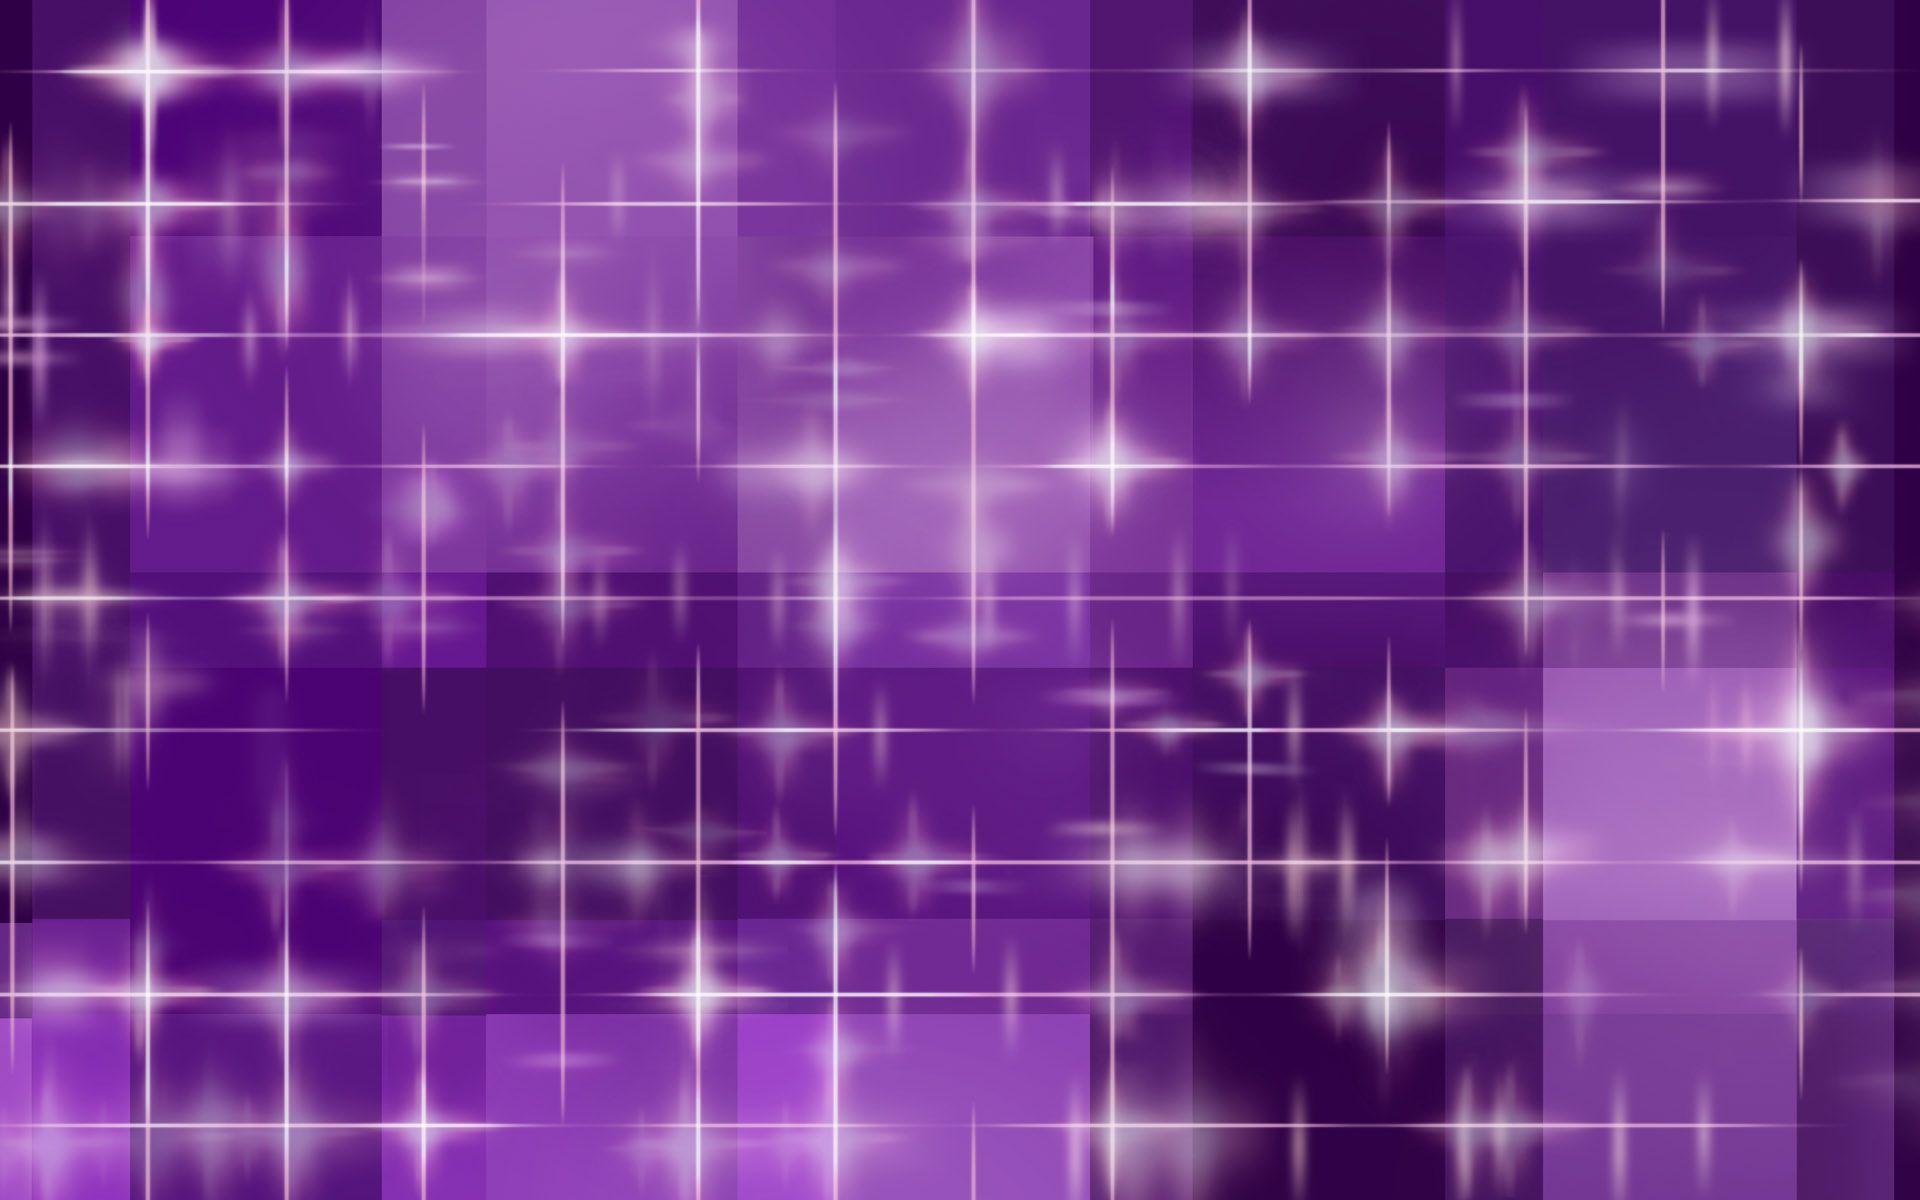 Purple Background Wallpaper Beautiful Purple Background